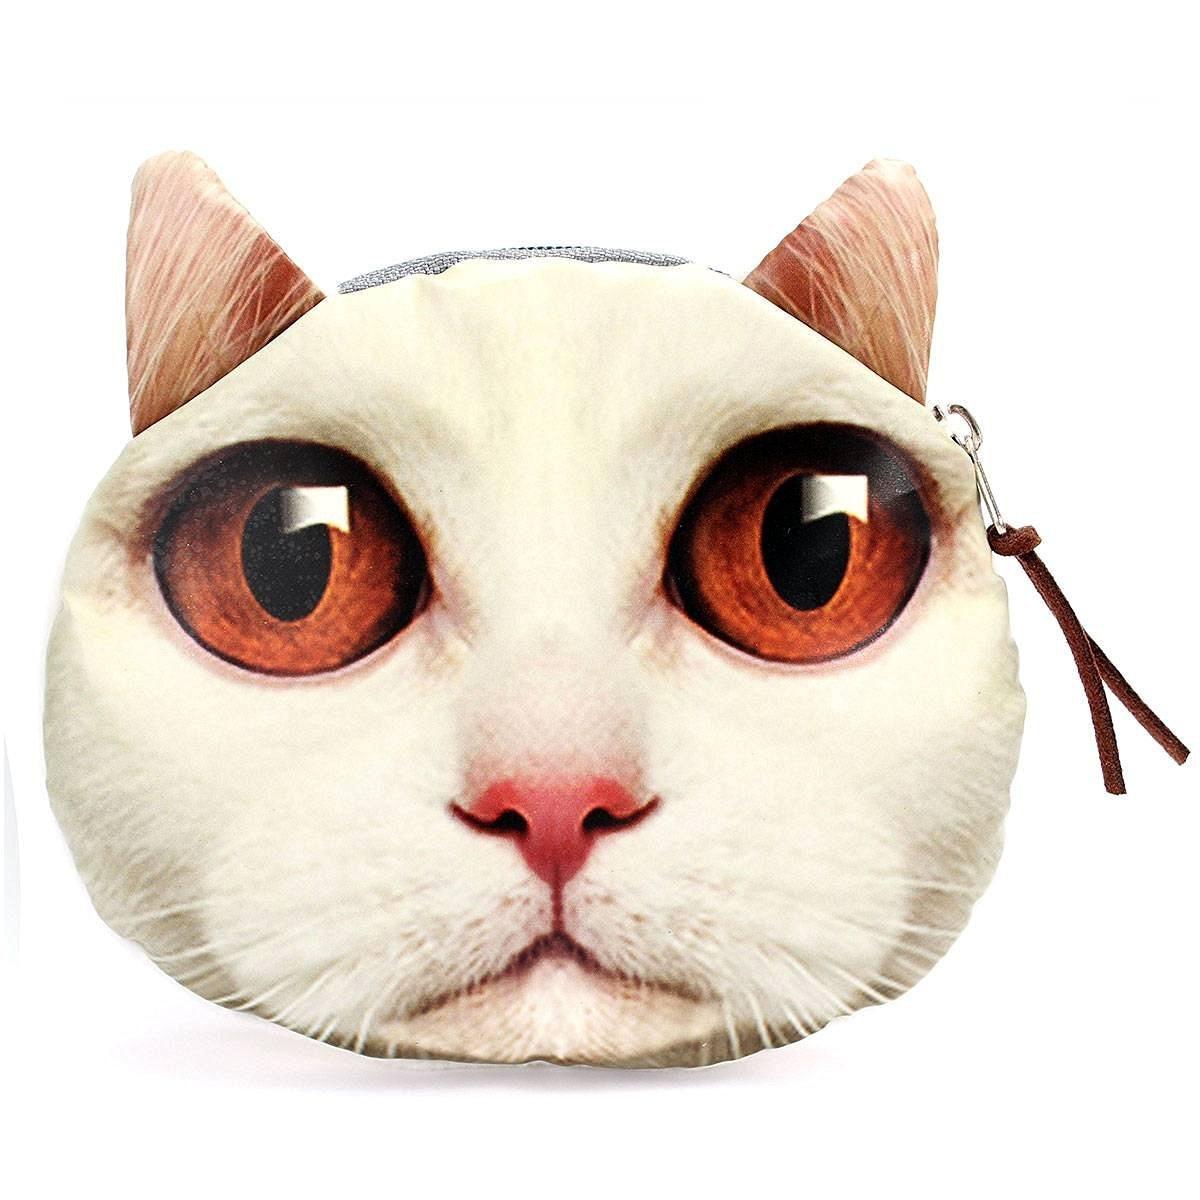 5) TEXU cute Cat face Coin Purse Zip Change Purse Wallet Kids Girl Women For Gift